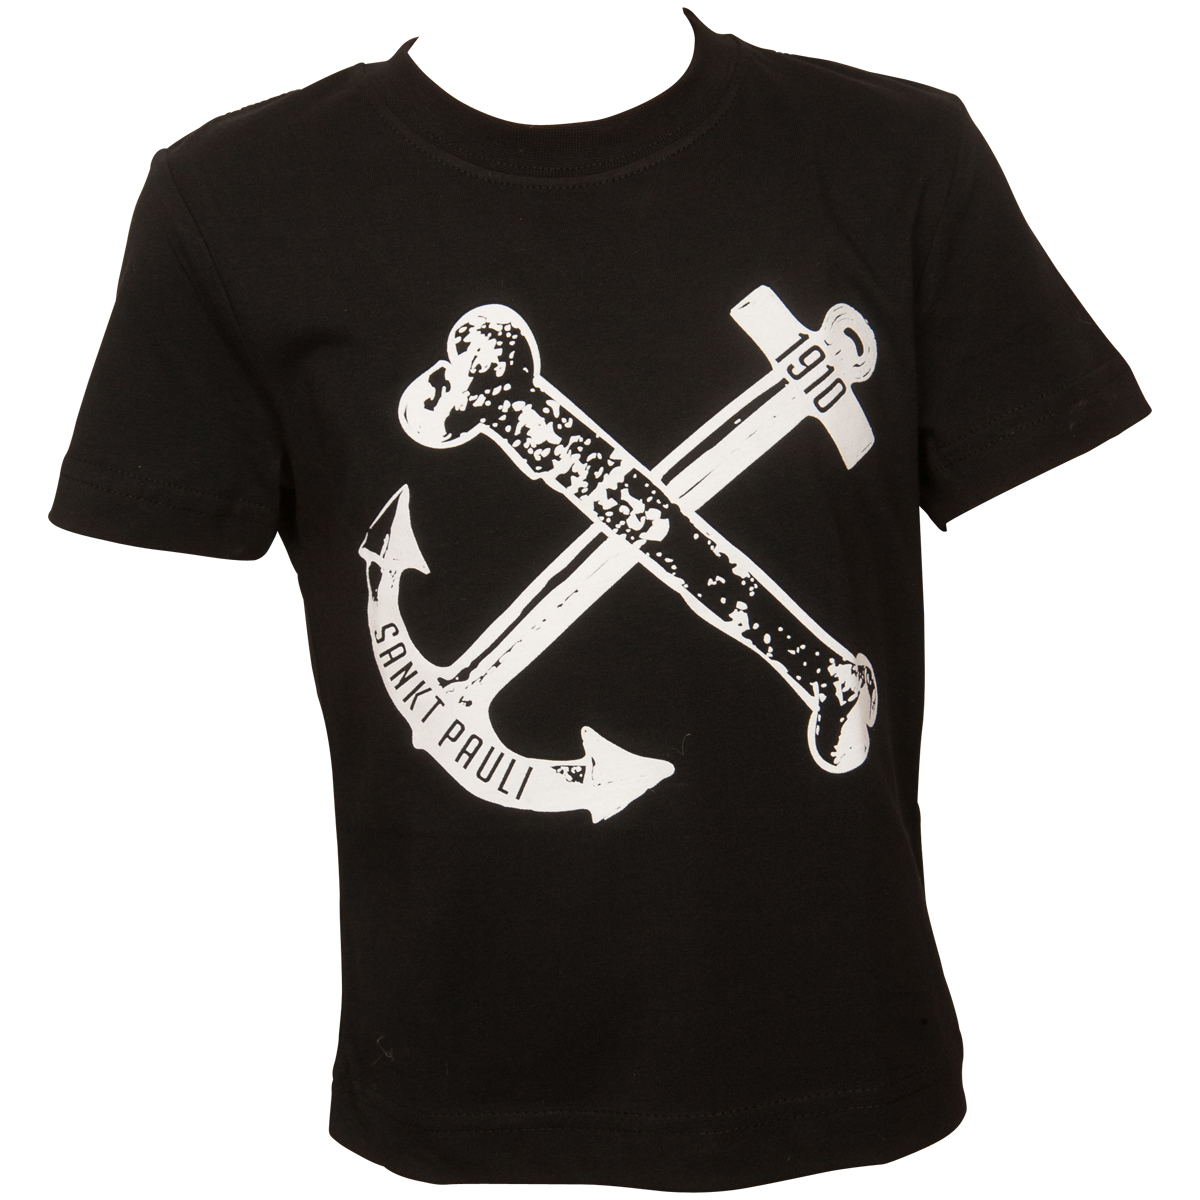 FC St. Pauli - Kinder T-Shirt Anker - schwarz